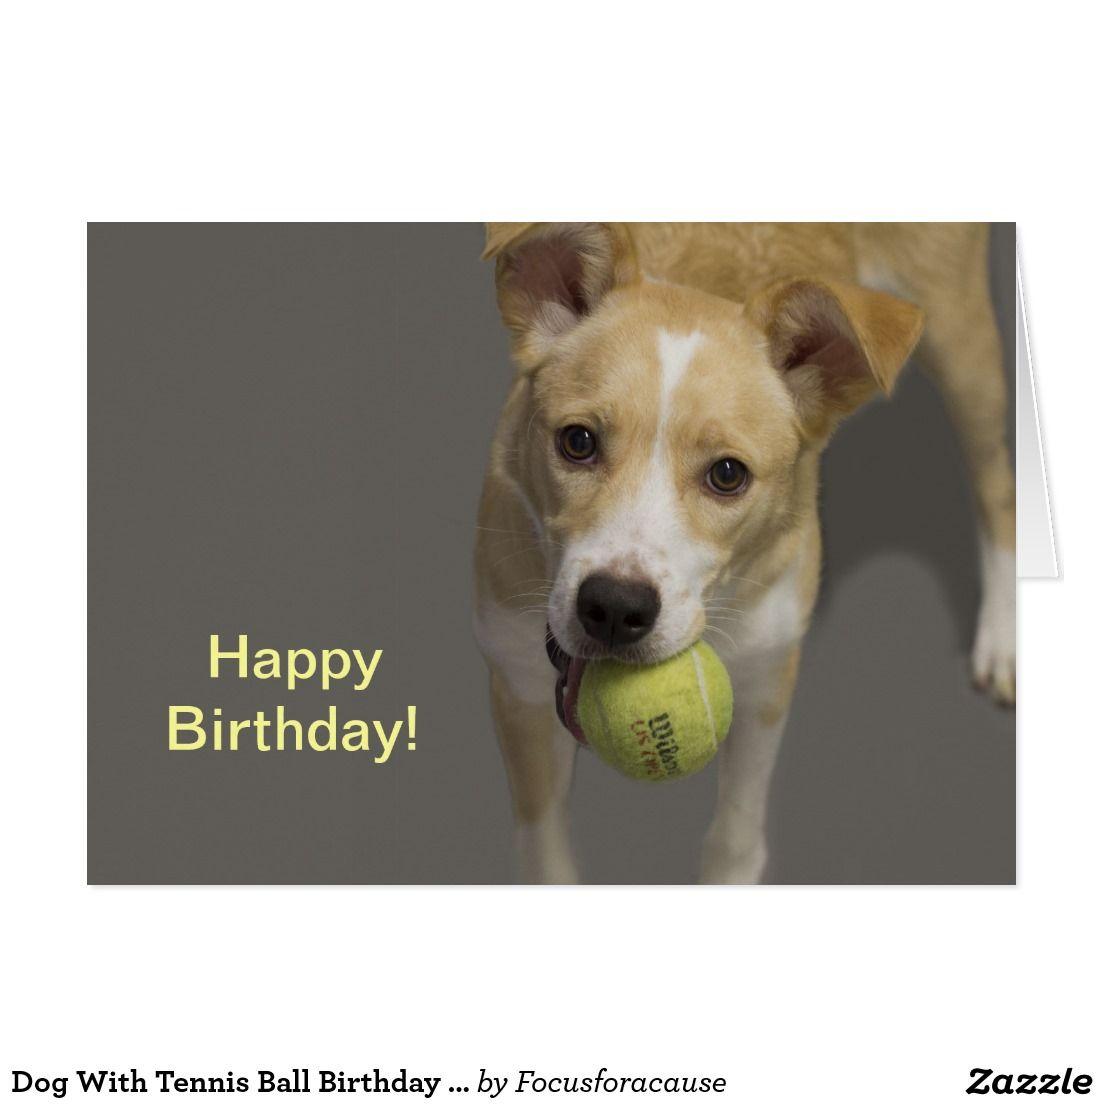 Dog With Tennis Ball Birthday Card Zazzle Com Dogs Ball